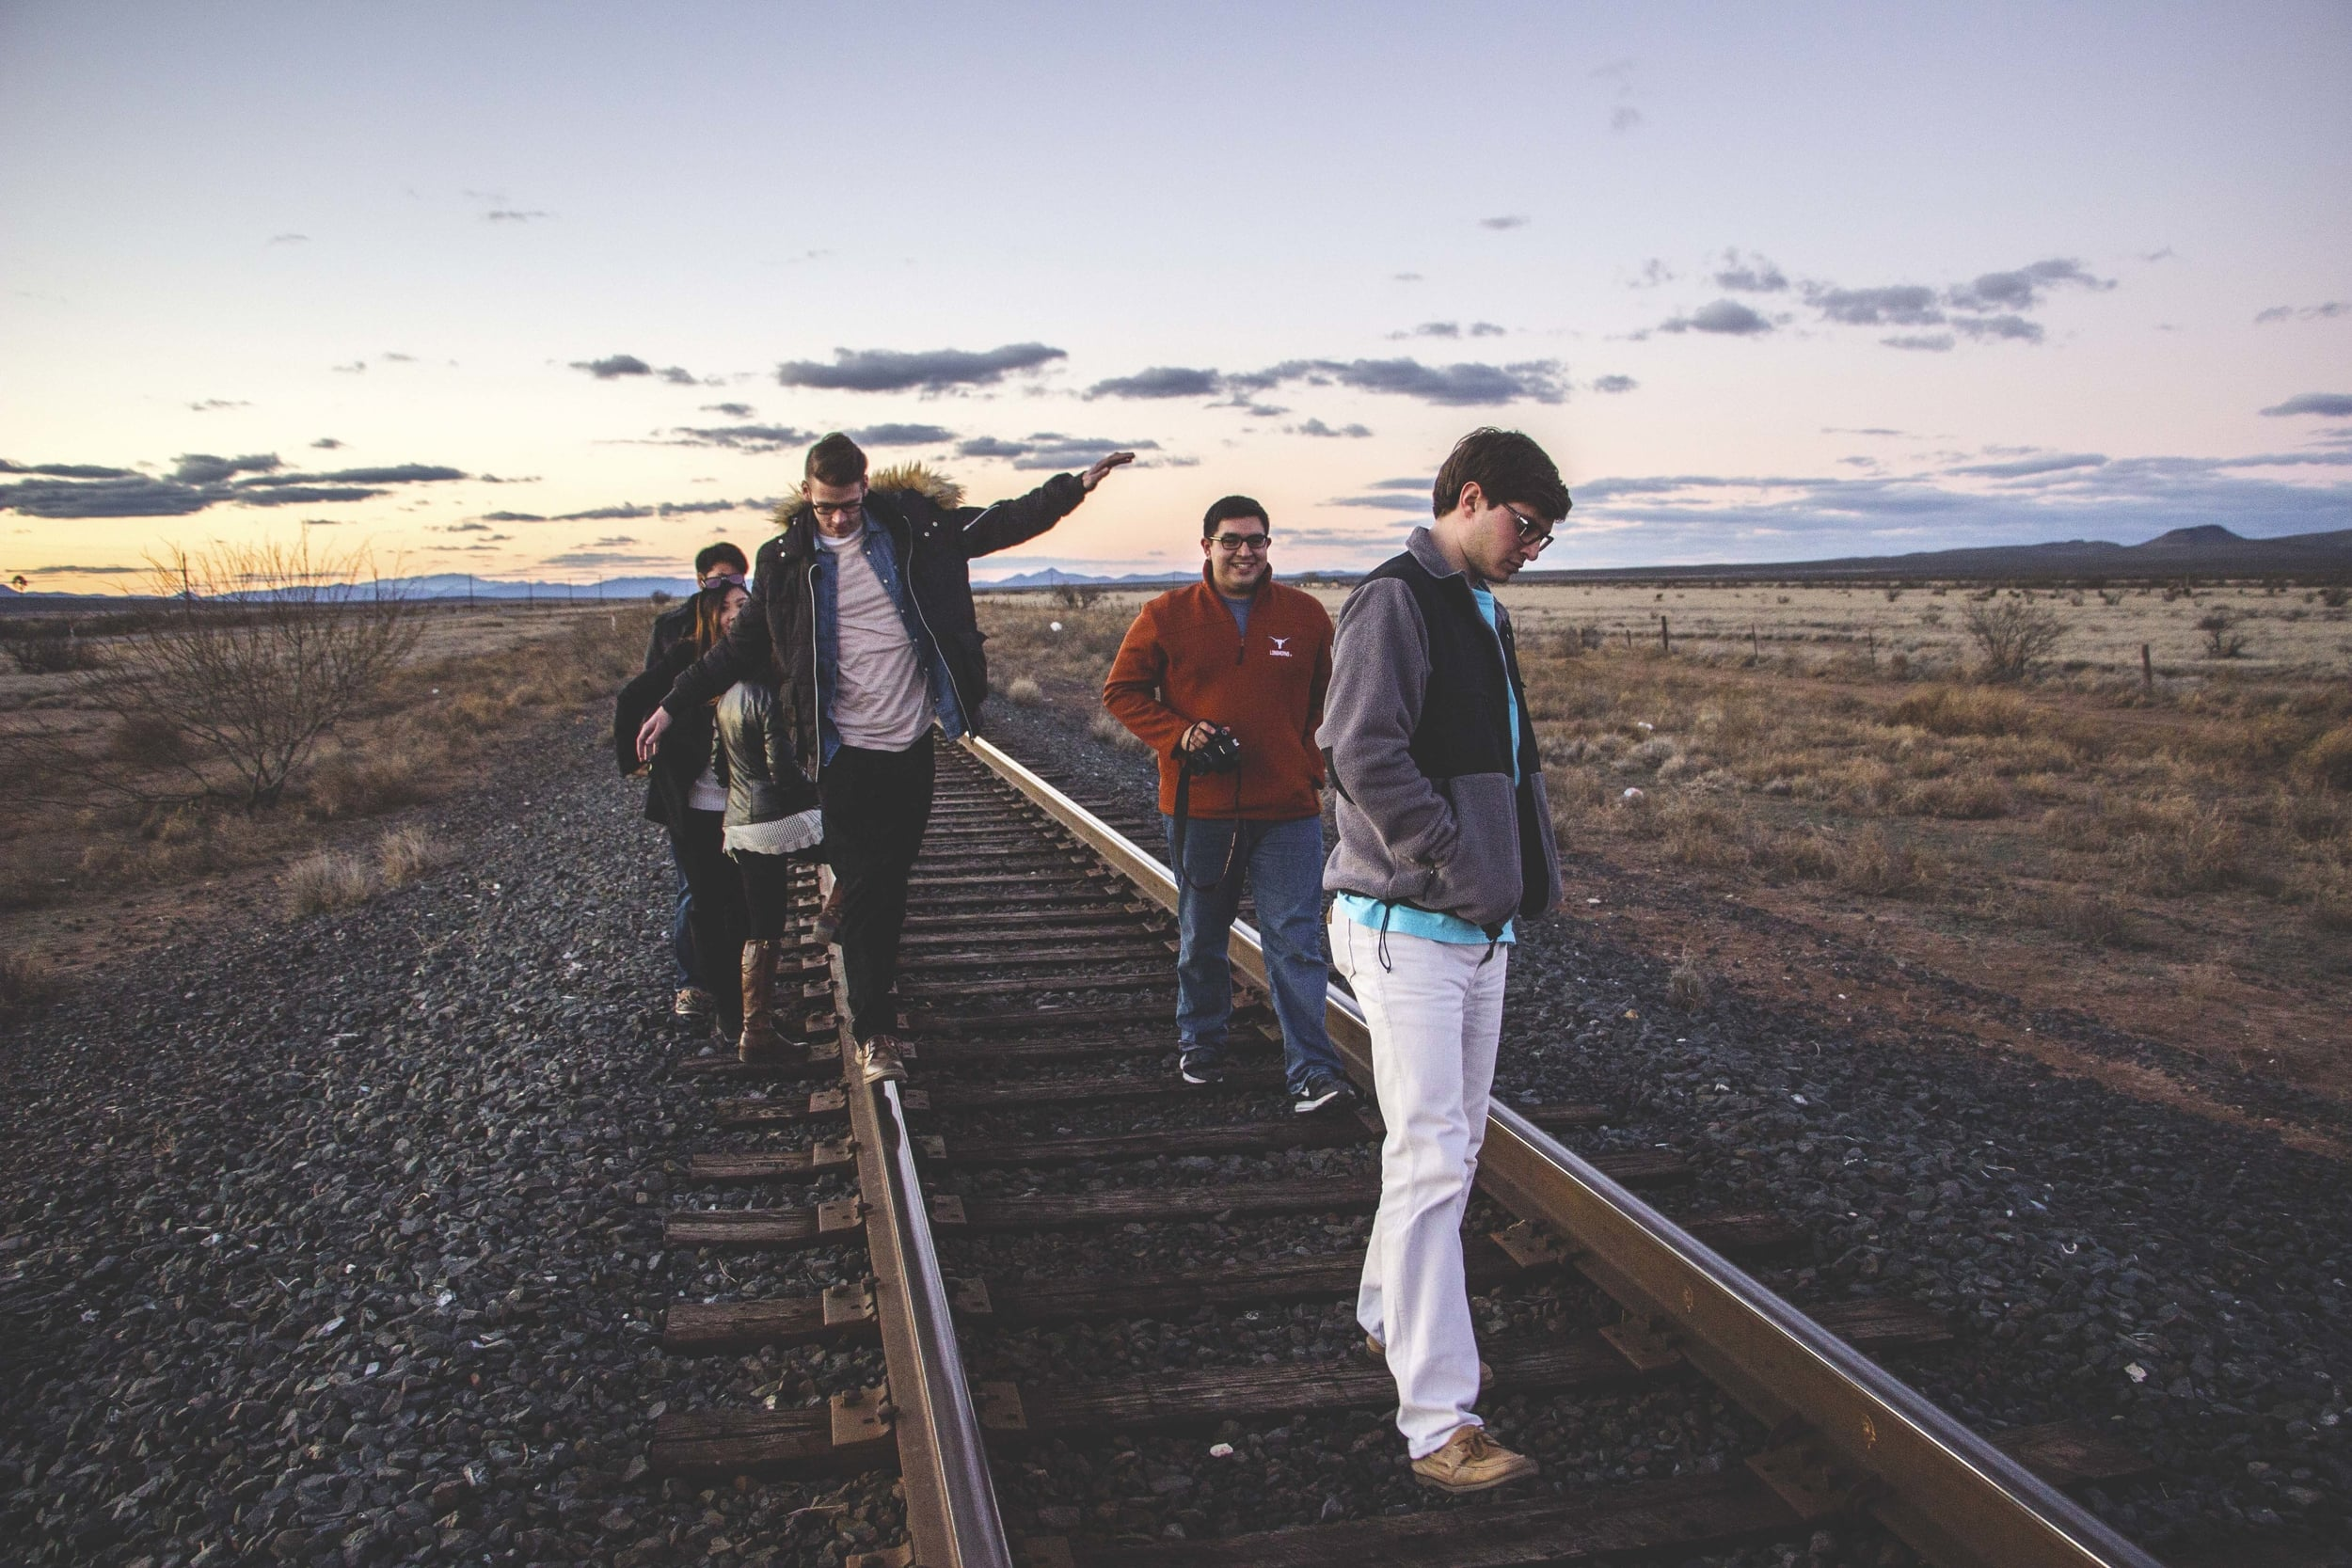 On the train tracks across the road from Prada Marfa.